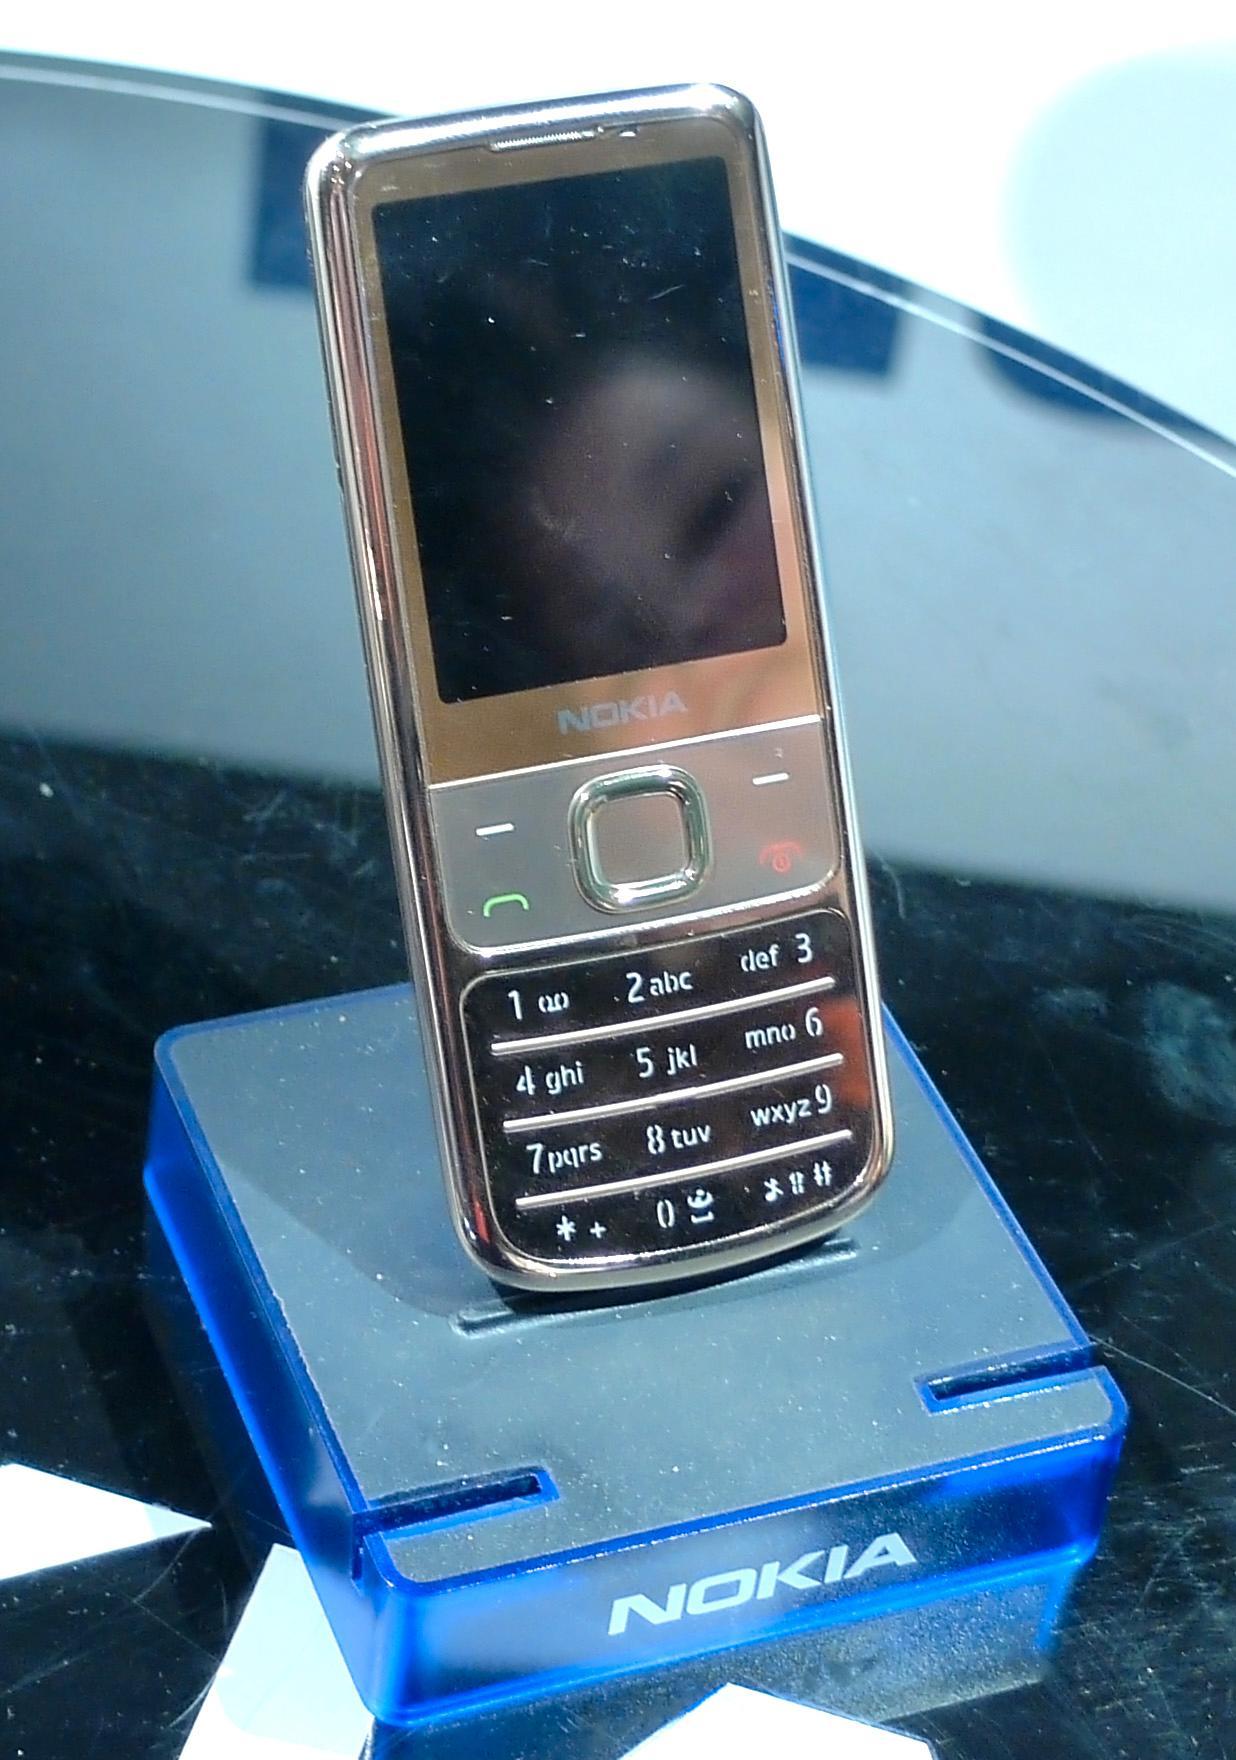 Nokia viste frem 6700 Classic i Gold-utgave på årets Elektrofil-messe.